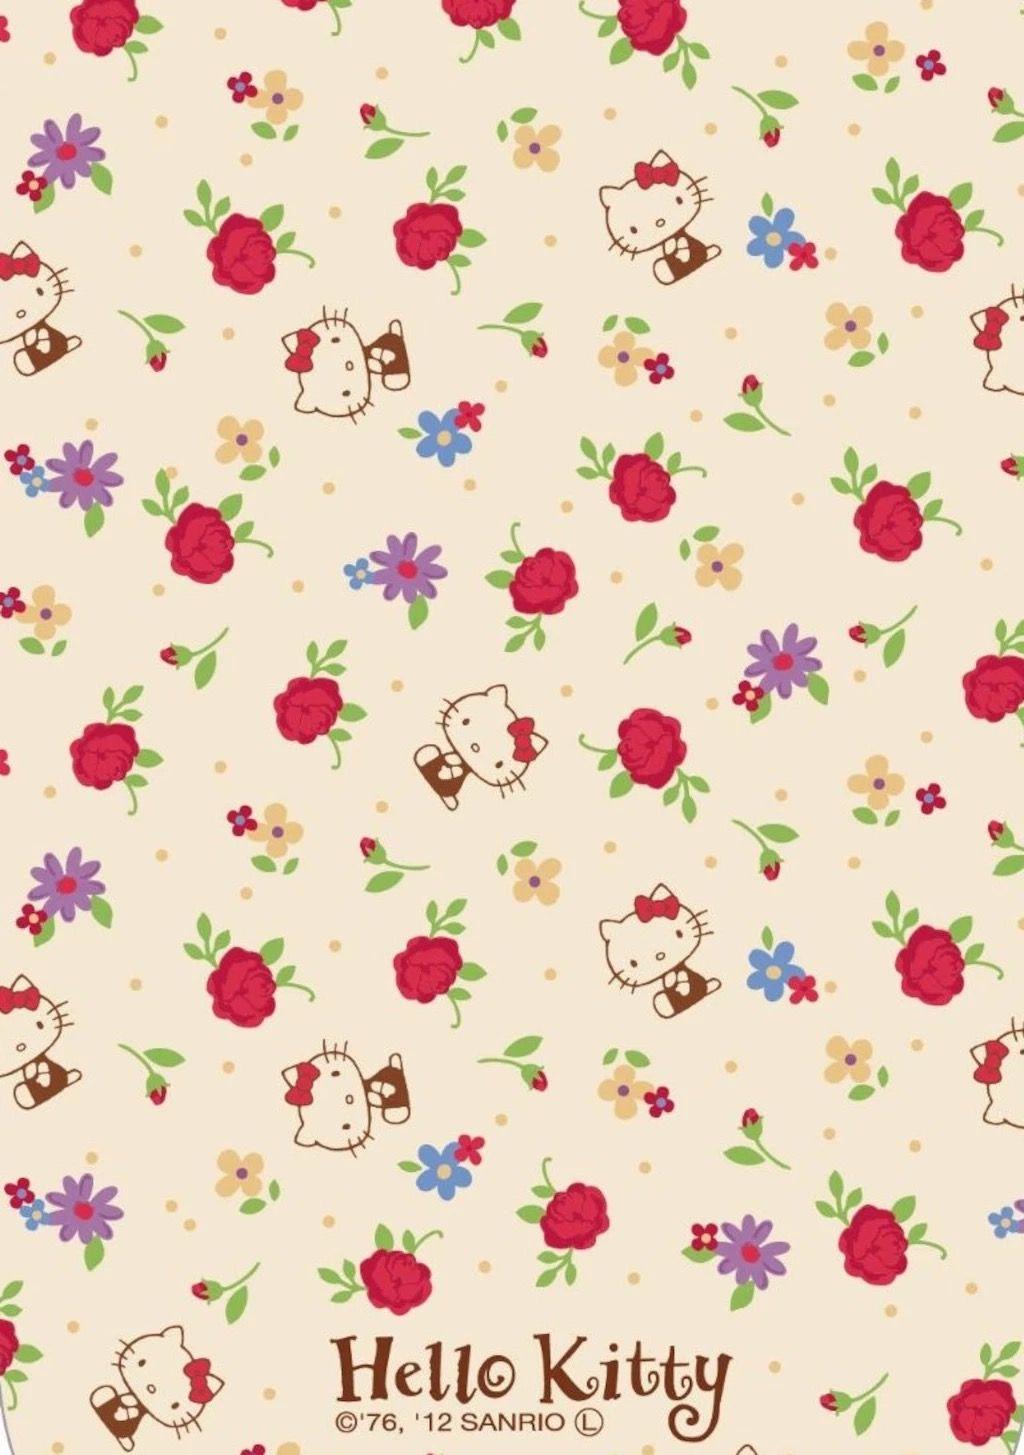 Popular Wallpaper Hello Kitty Smartphone - 7b651df7c93296697f05b93e2ef4dfc0  Pic_95563.jpg